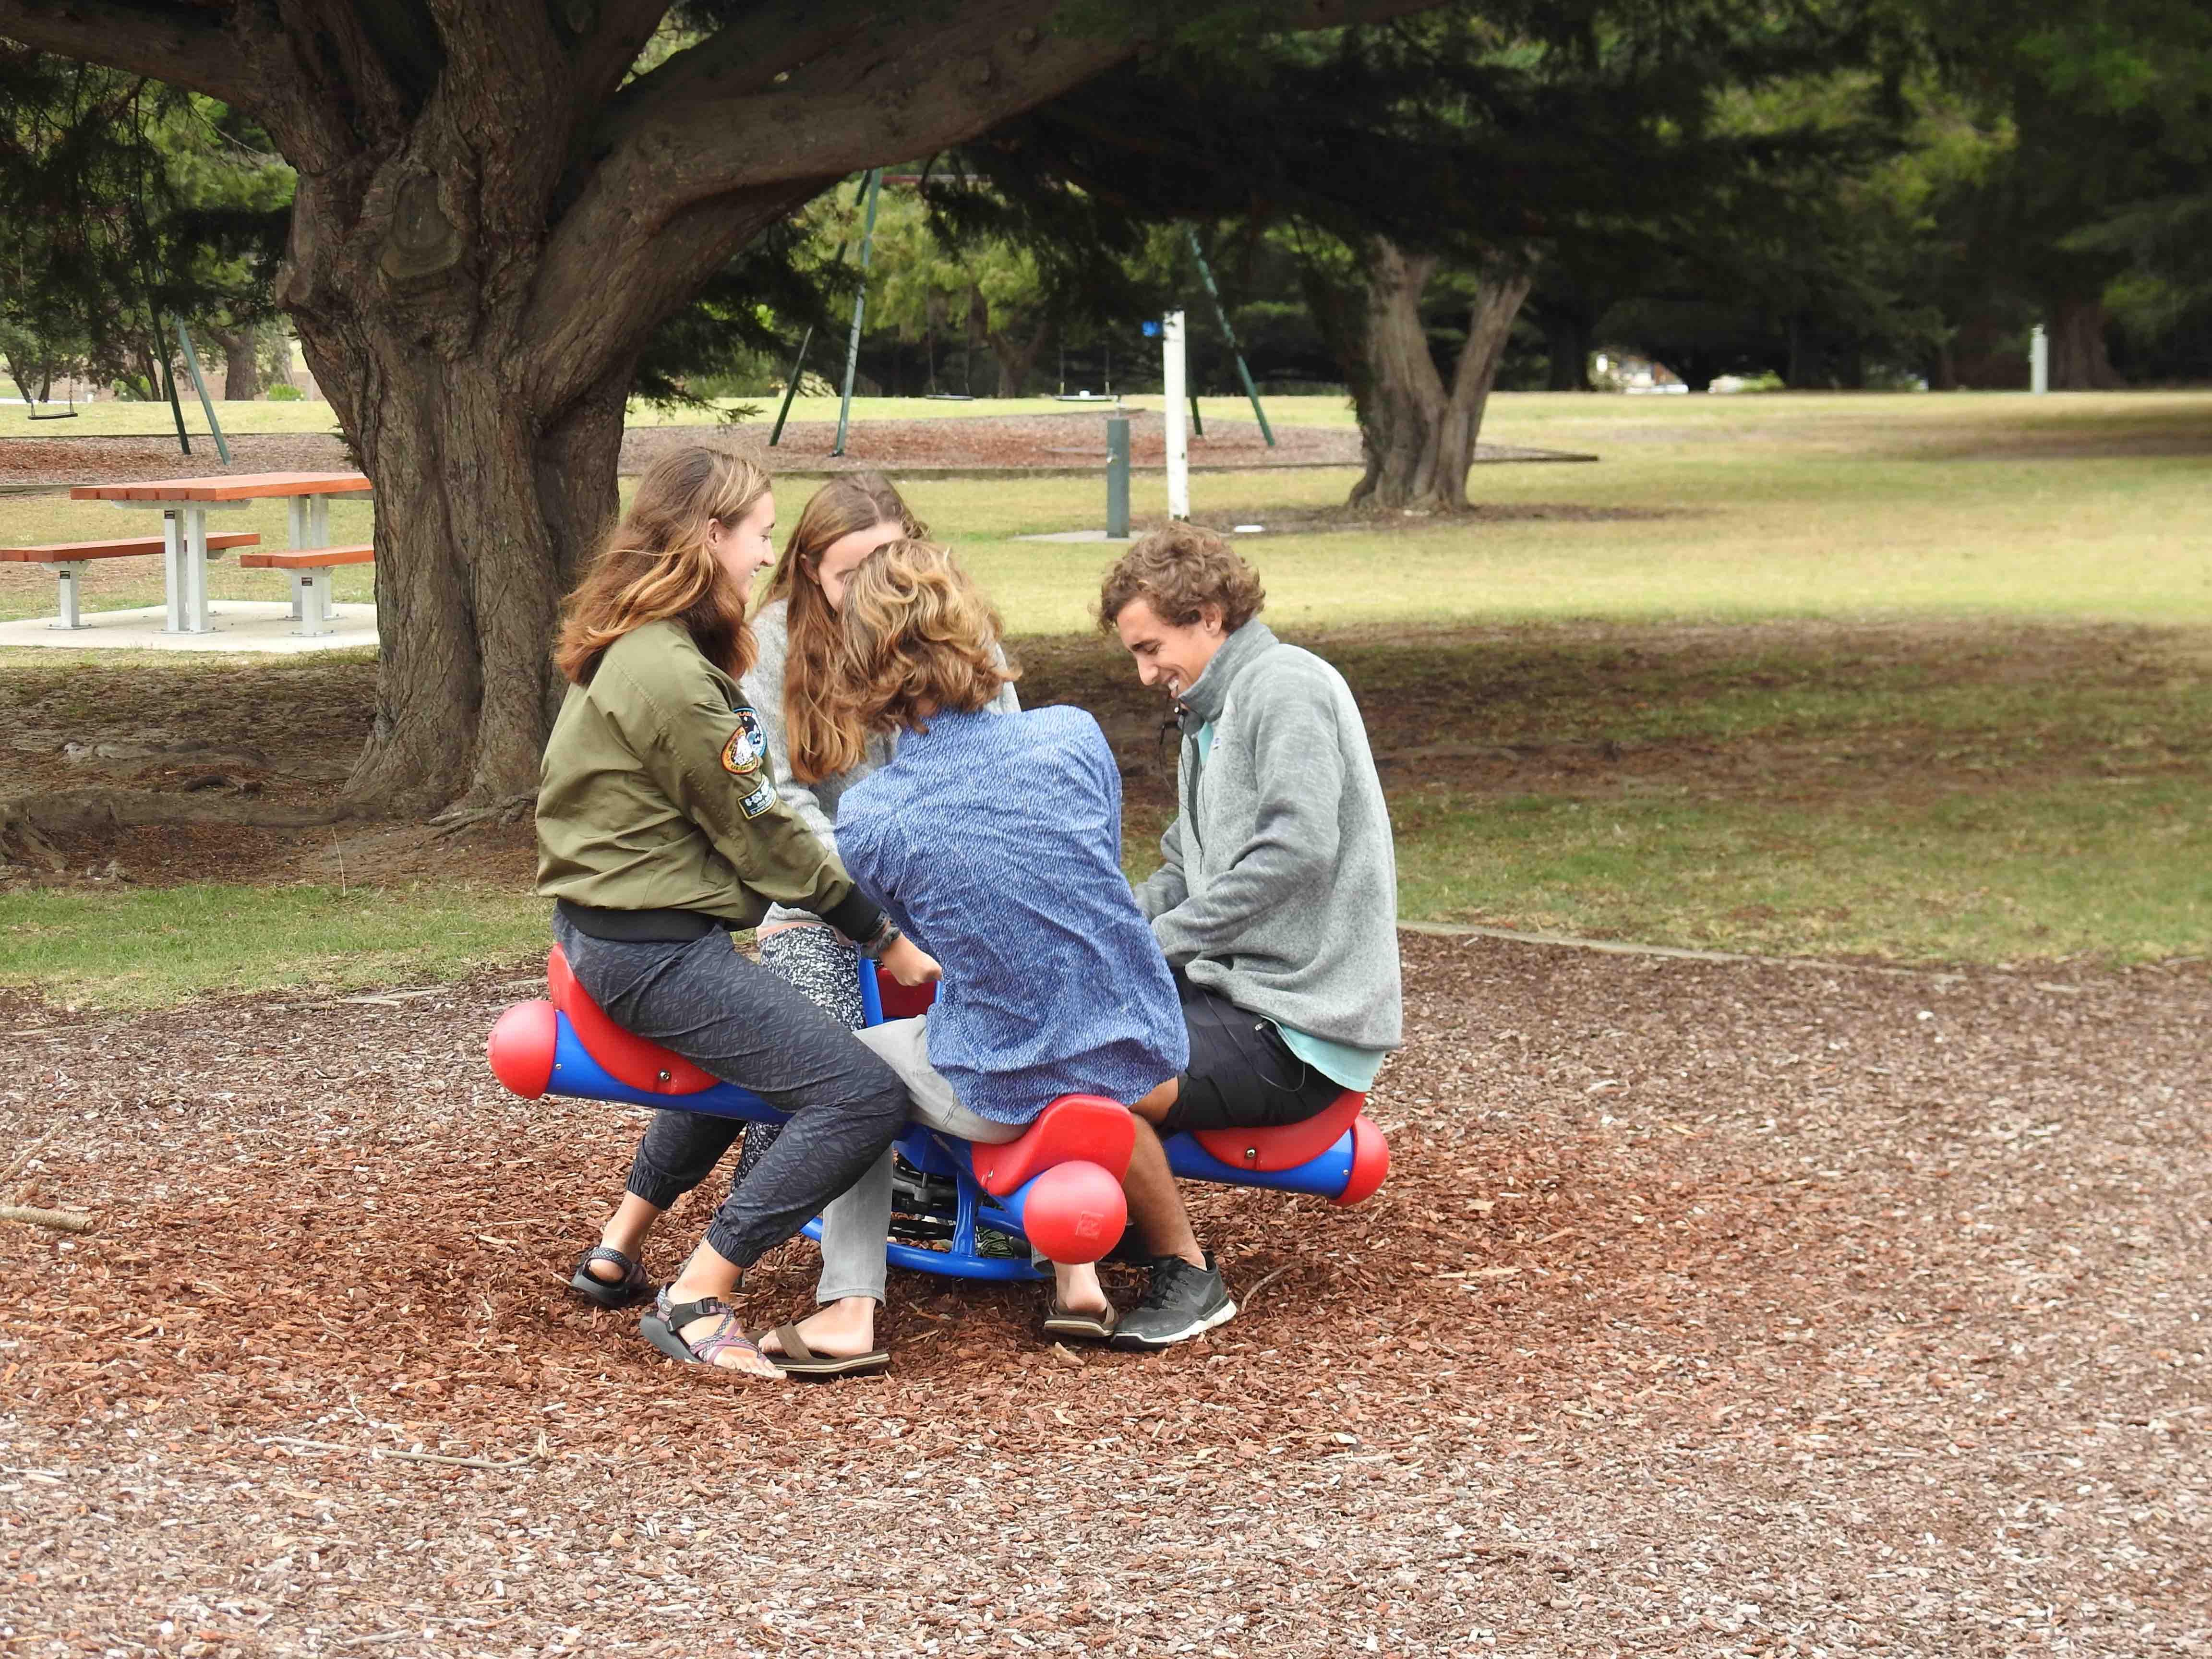 Kids on toy3.jpg